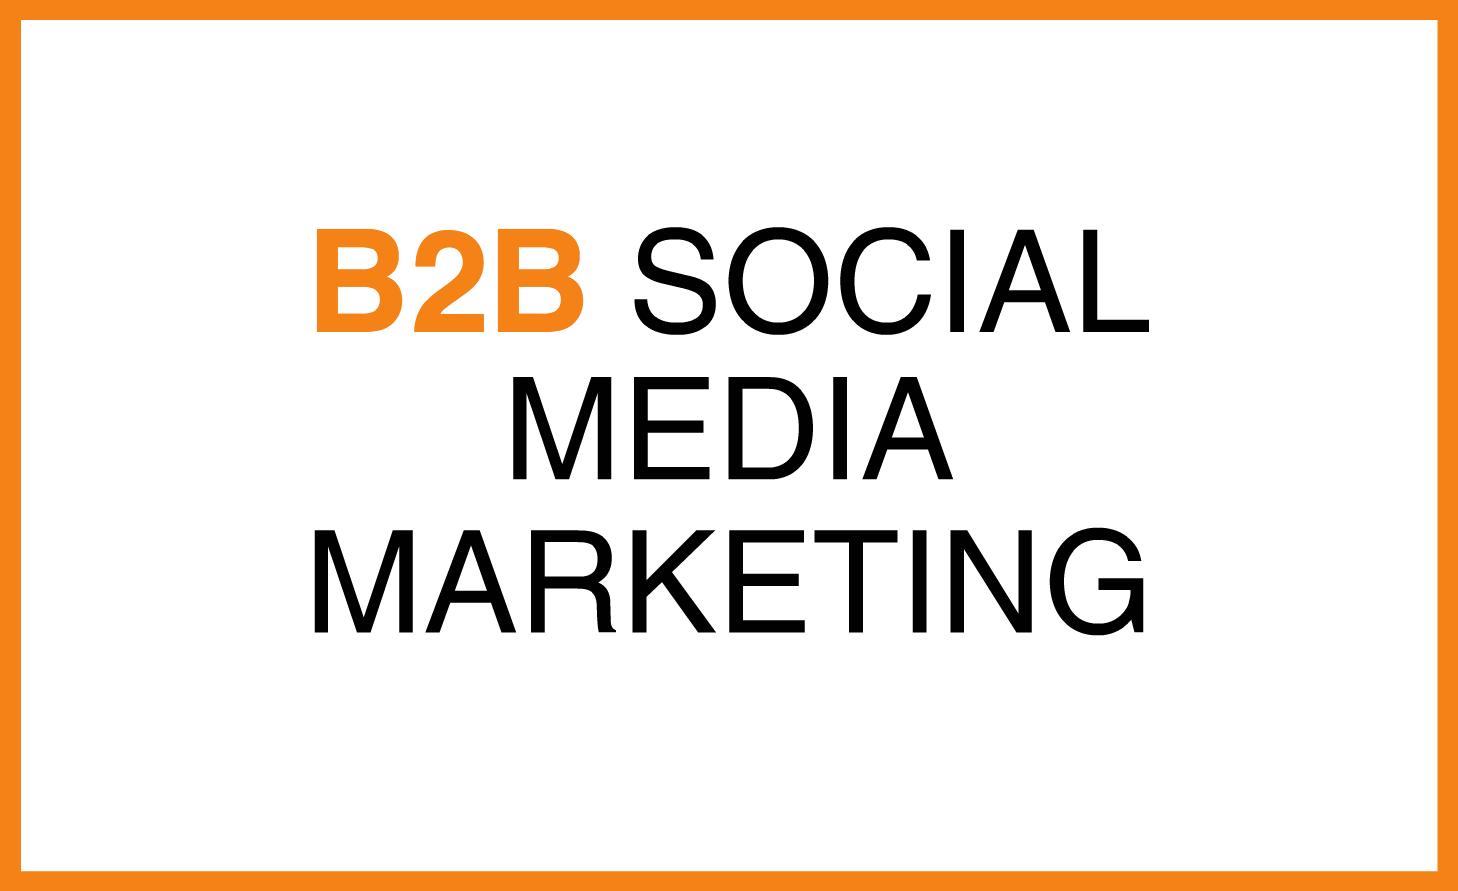 B2B social media marketing.png